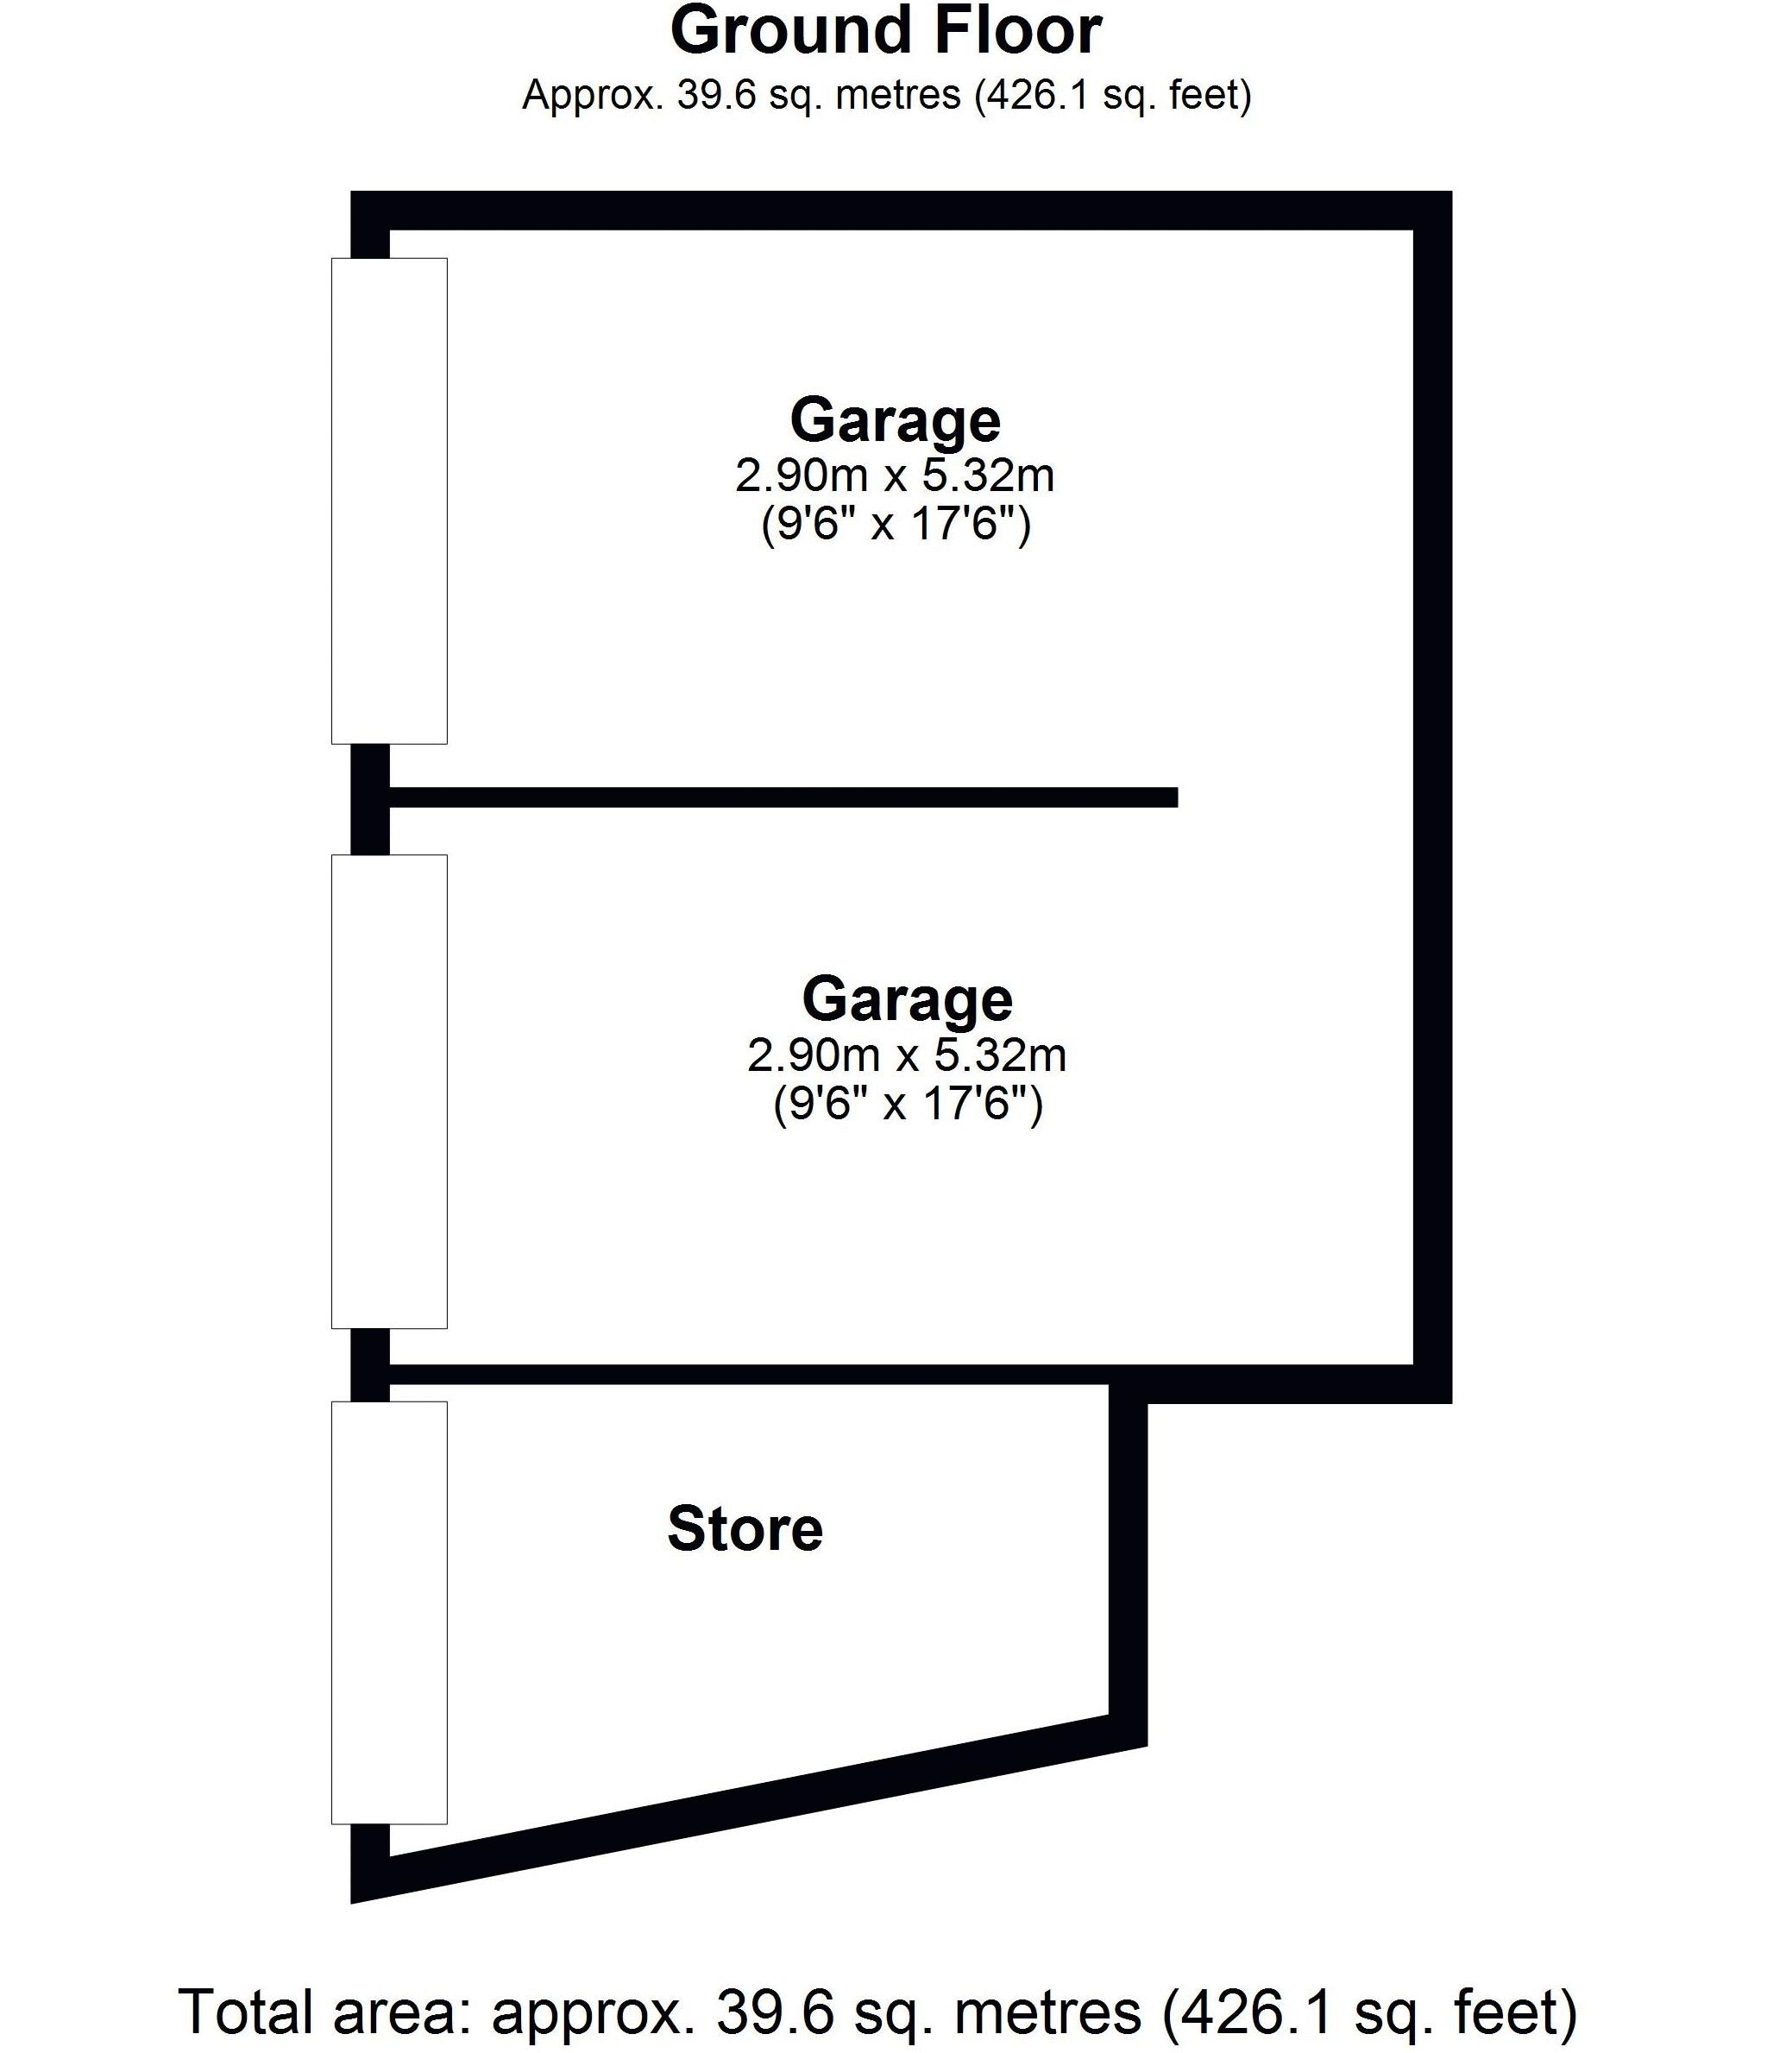 15 Hadley road Garage / Workshop Floor Plan